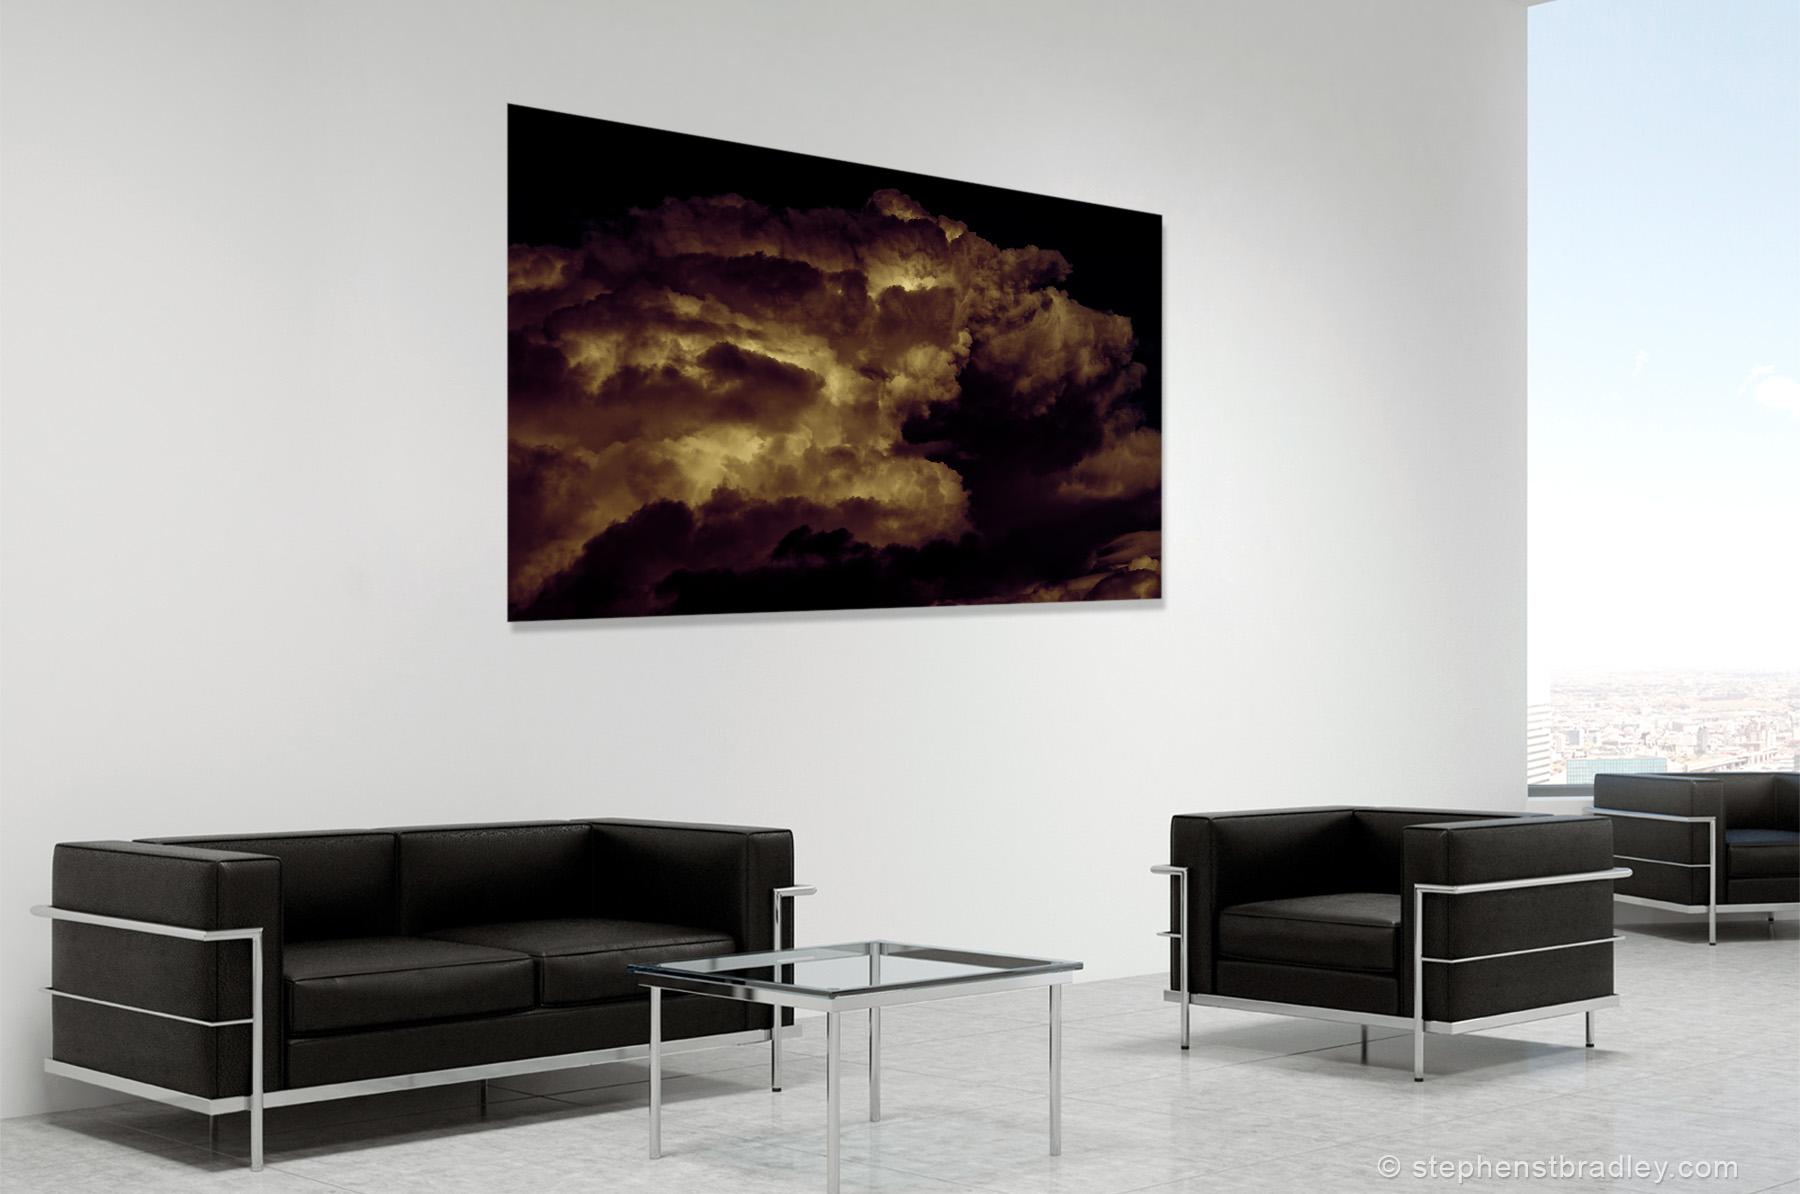 Skypig. Fine art photo of Ireland in room setting, cropped - Stephen S T Bradley